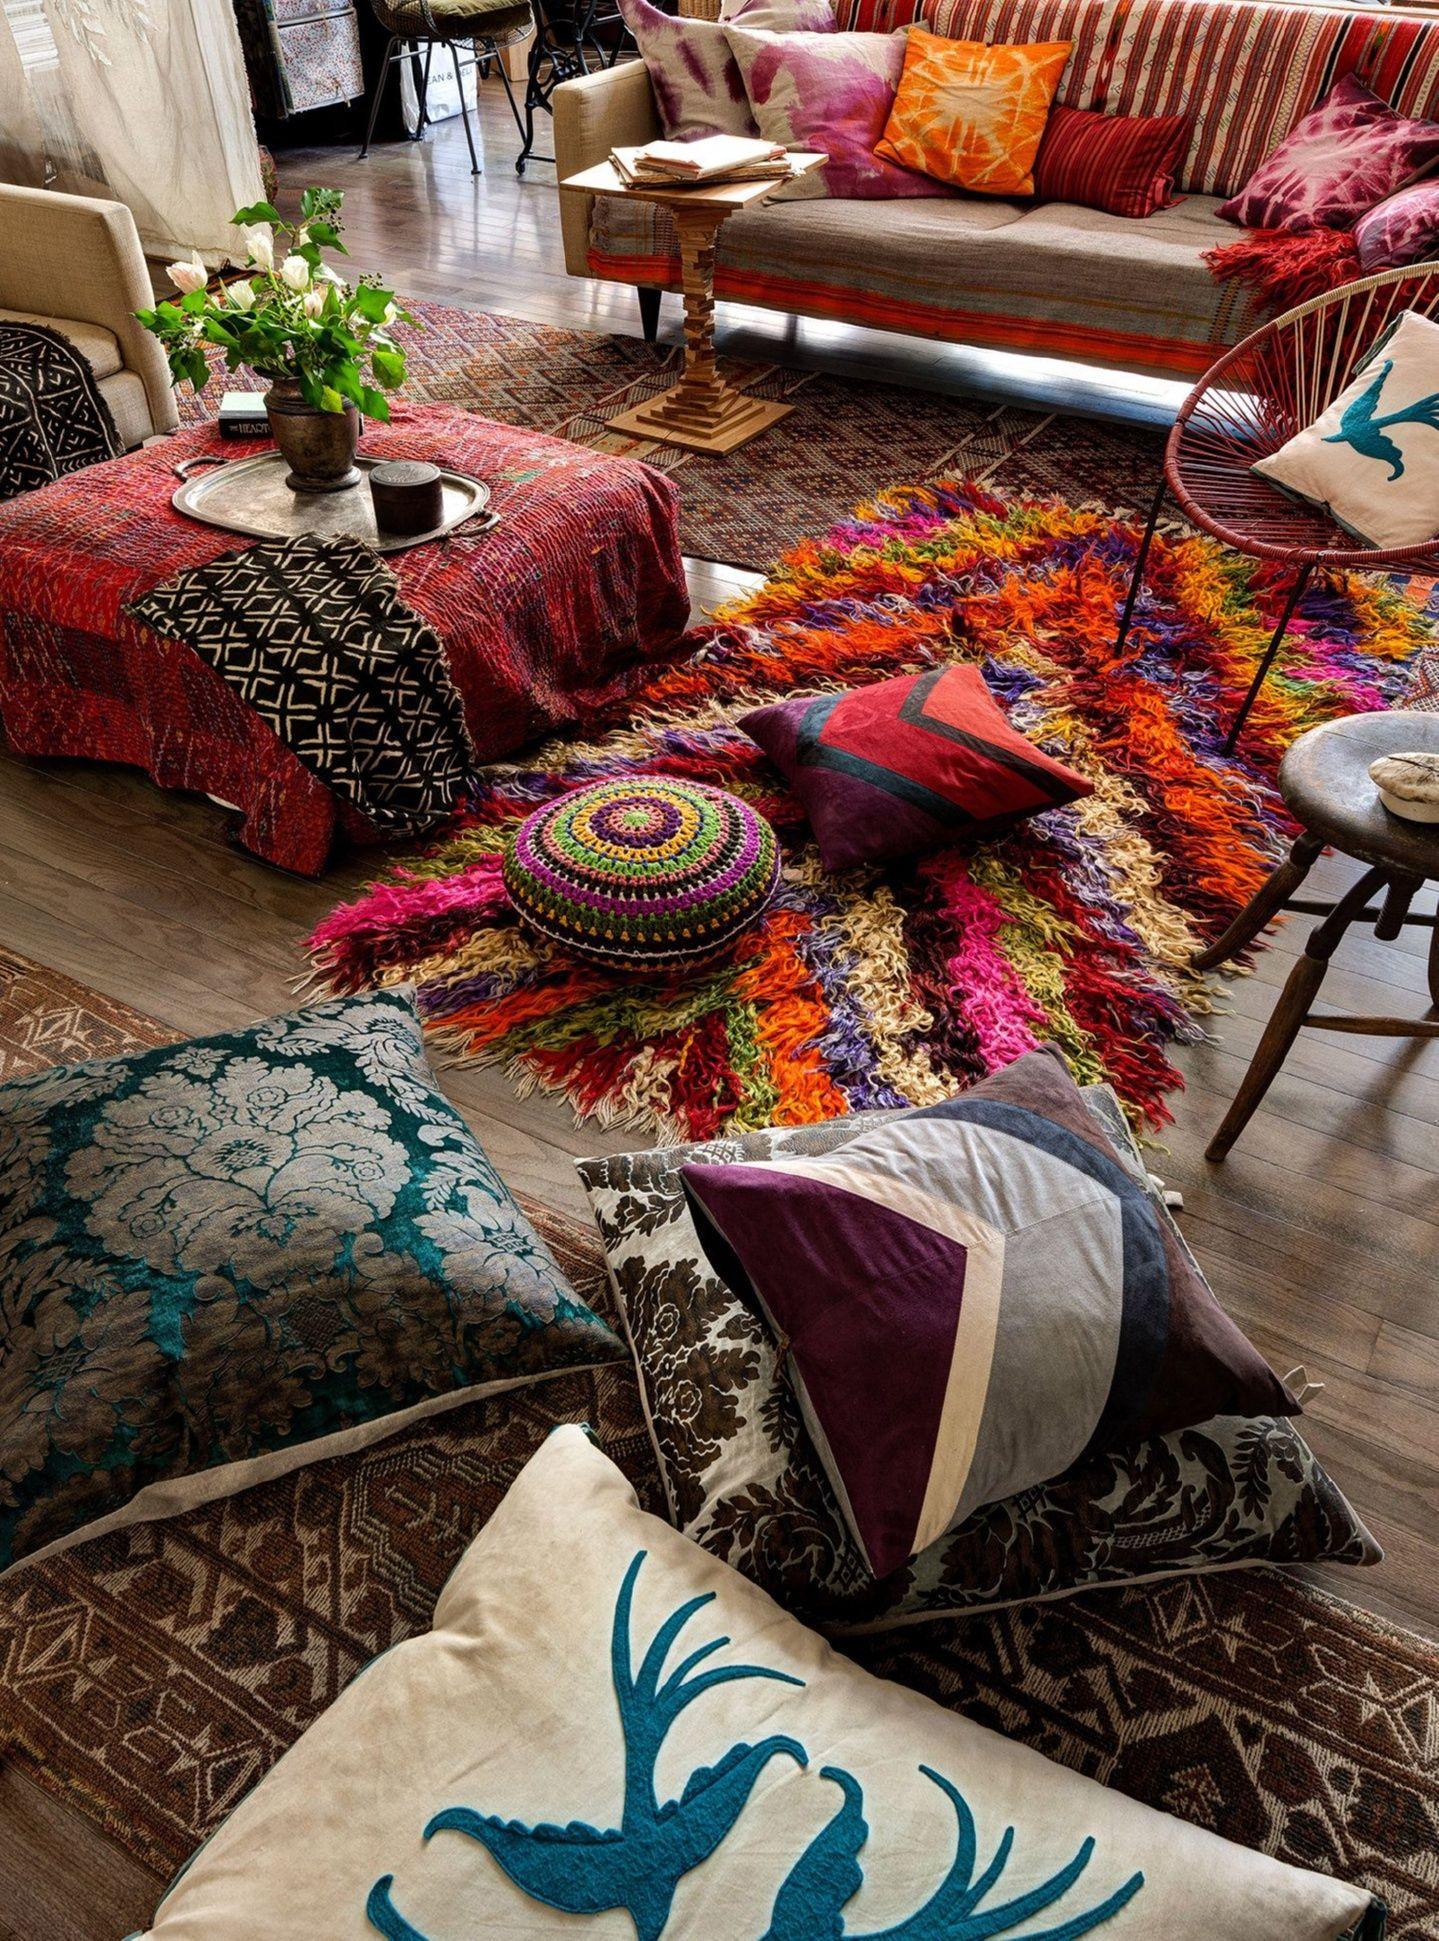 Large Moroccan Floor Cushions Michele Varian And Brad Roberts S Fourth Floor Soho Loft See Th Bohemian Living Room Decor Bohemian Style Decor Bohemian Decor